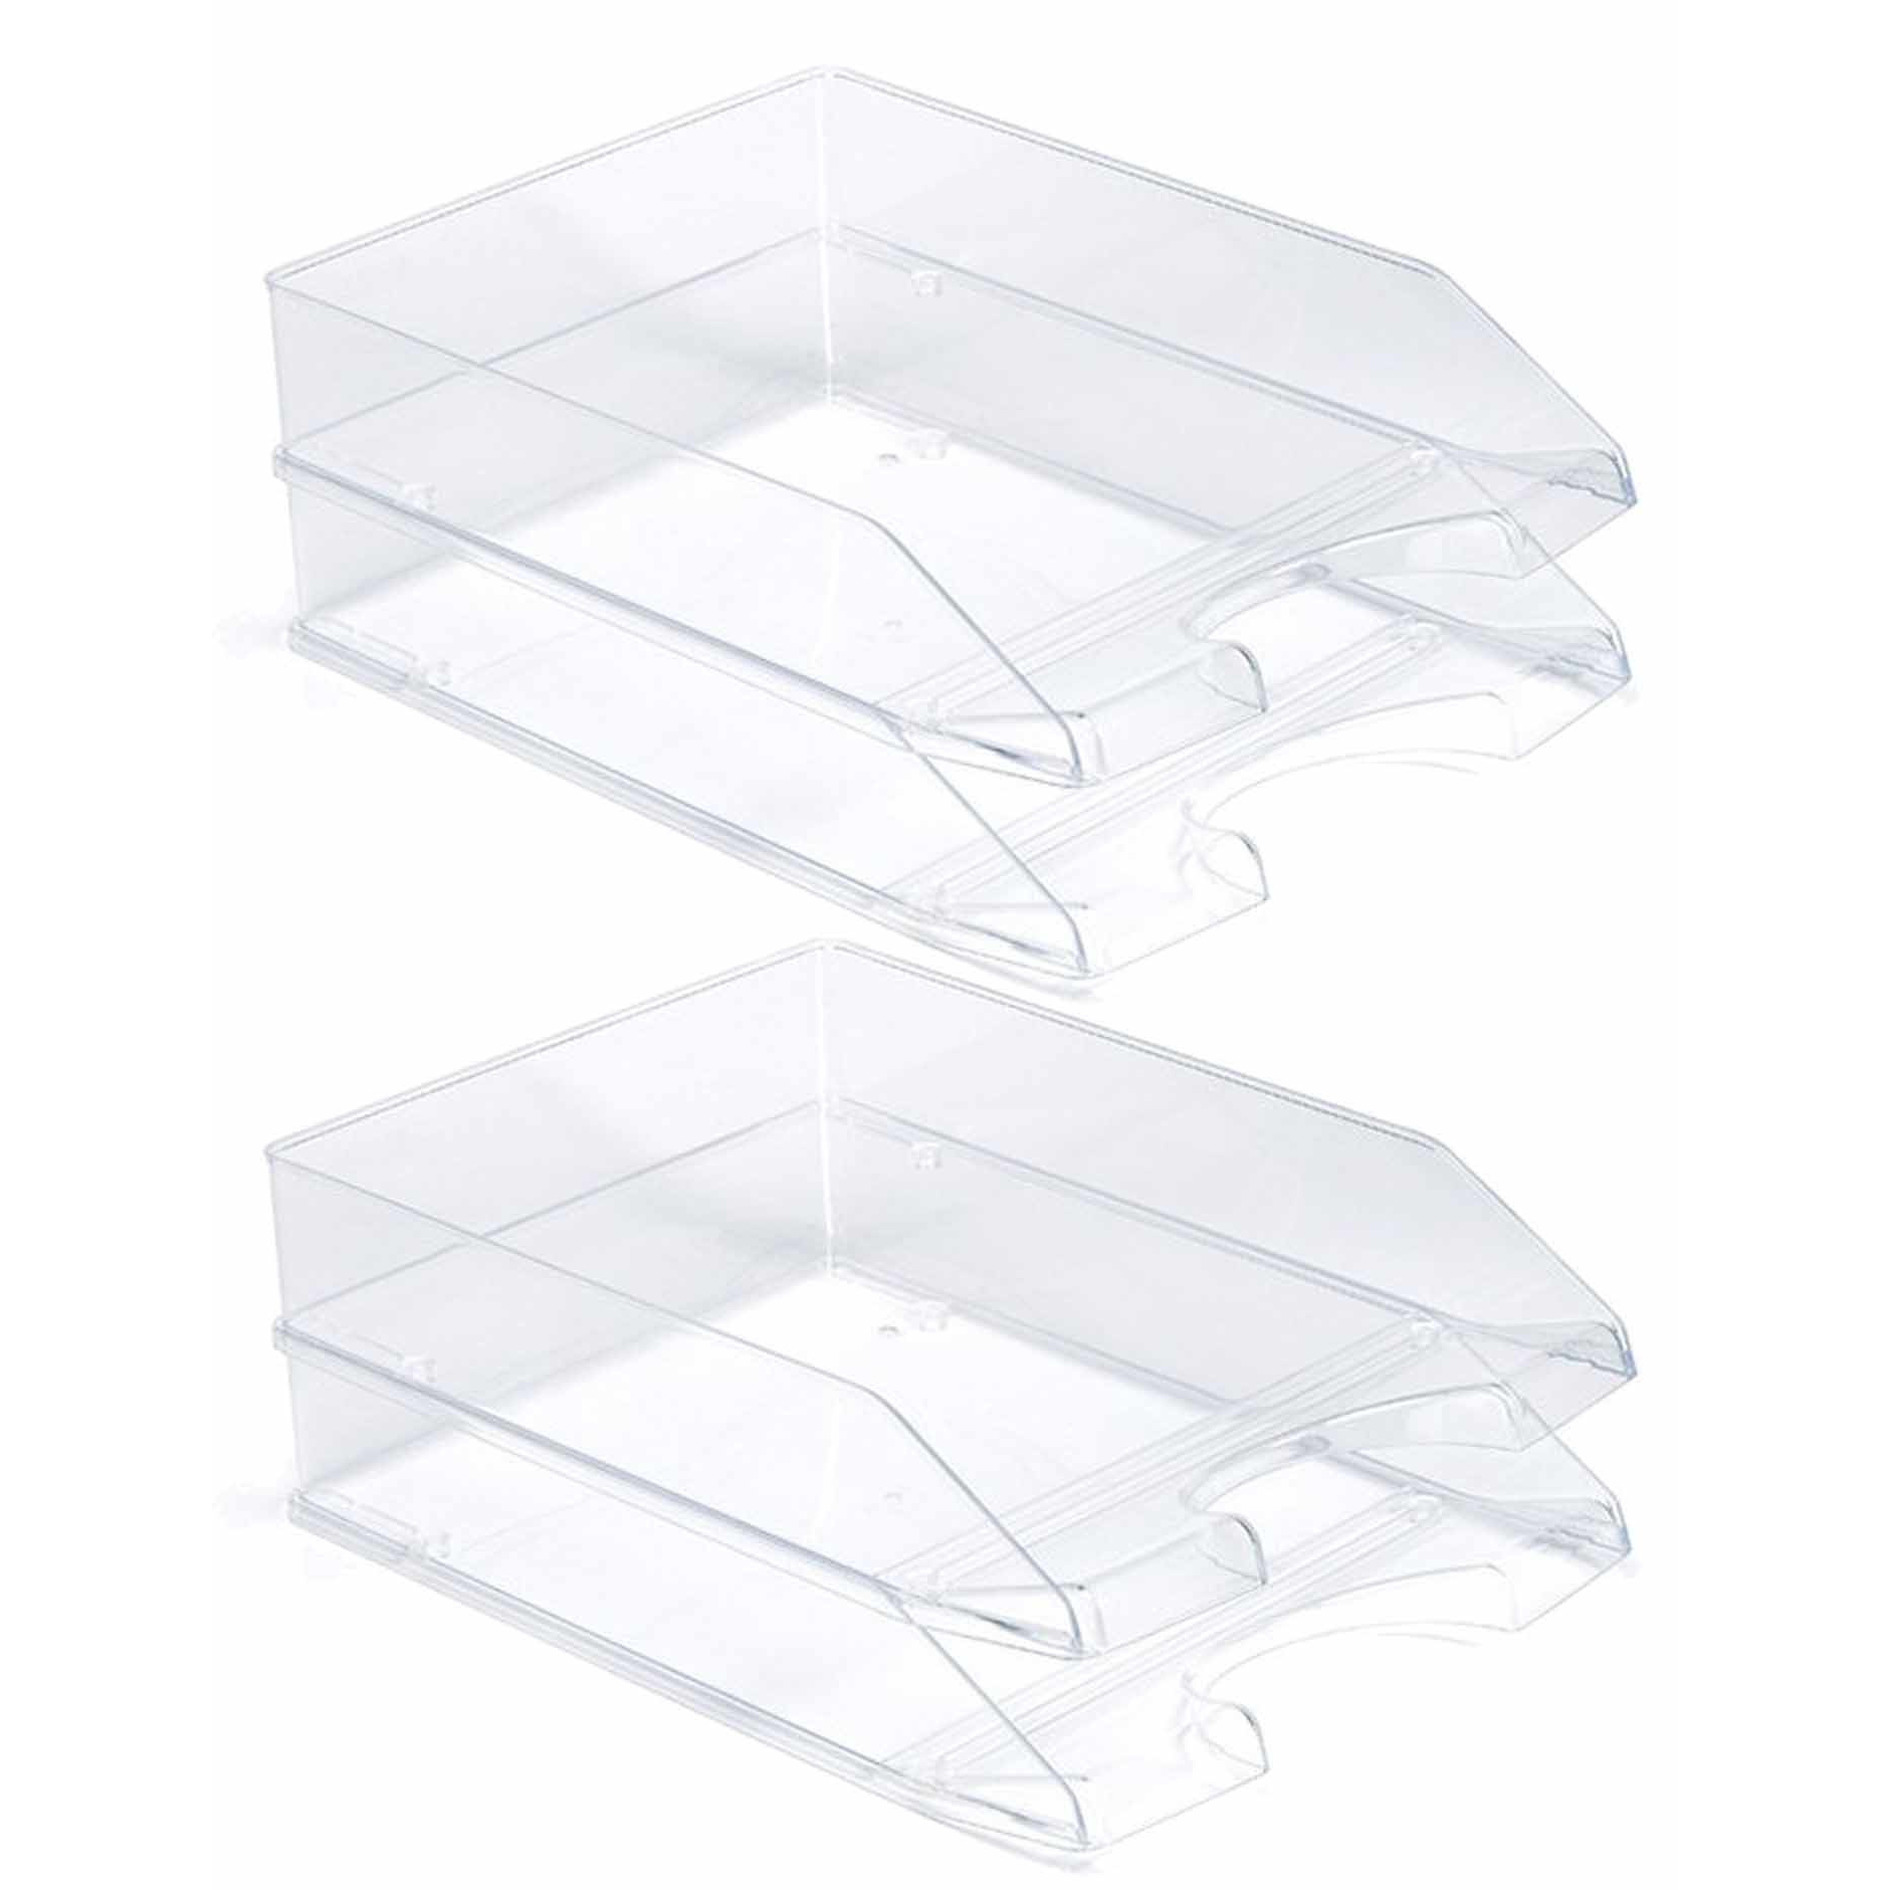 Pakket van 12x stuks postbakjejes transparant a4 formaat